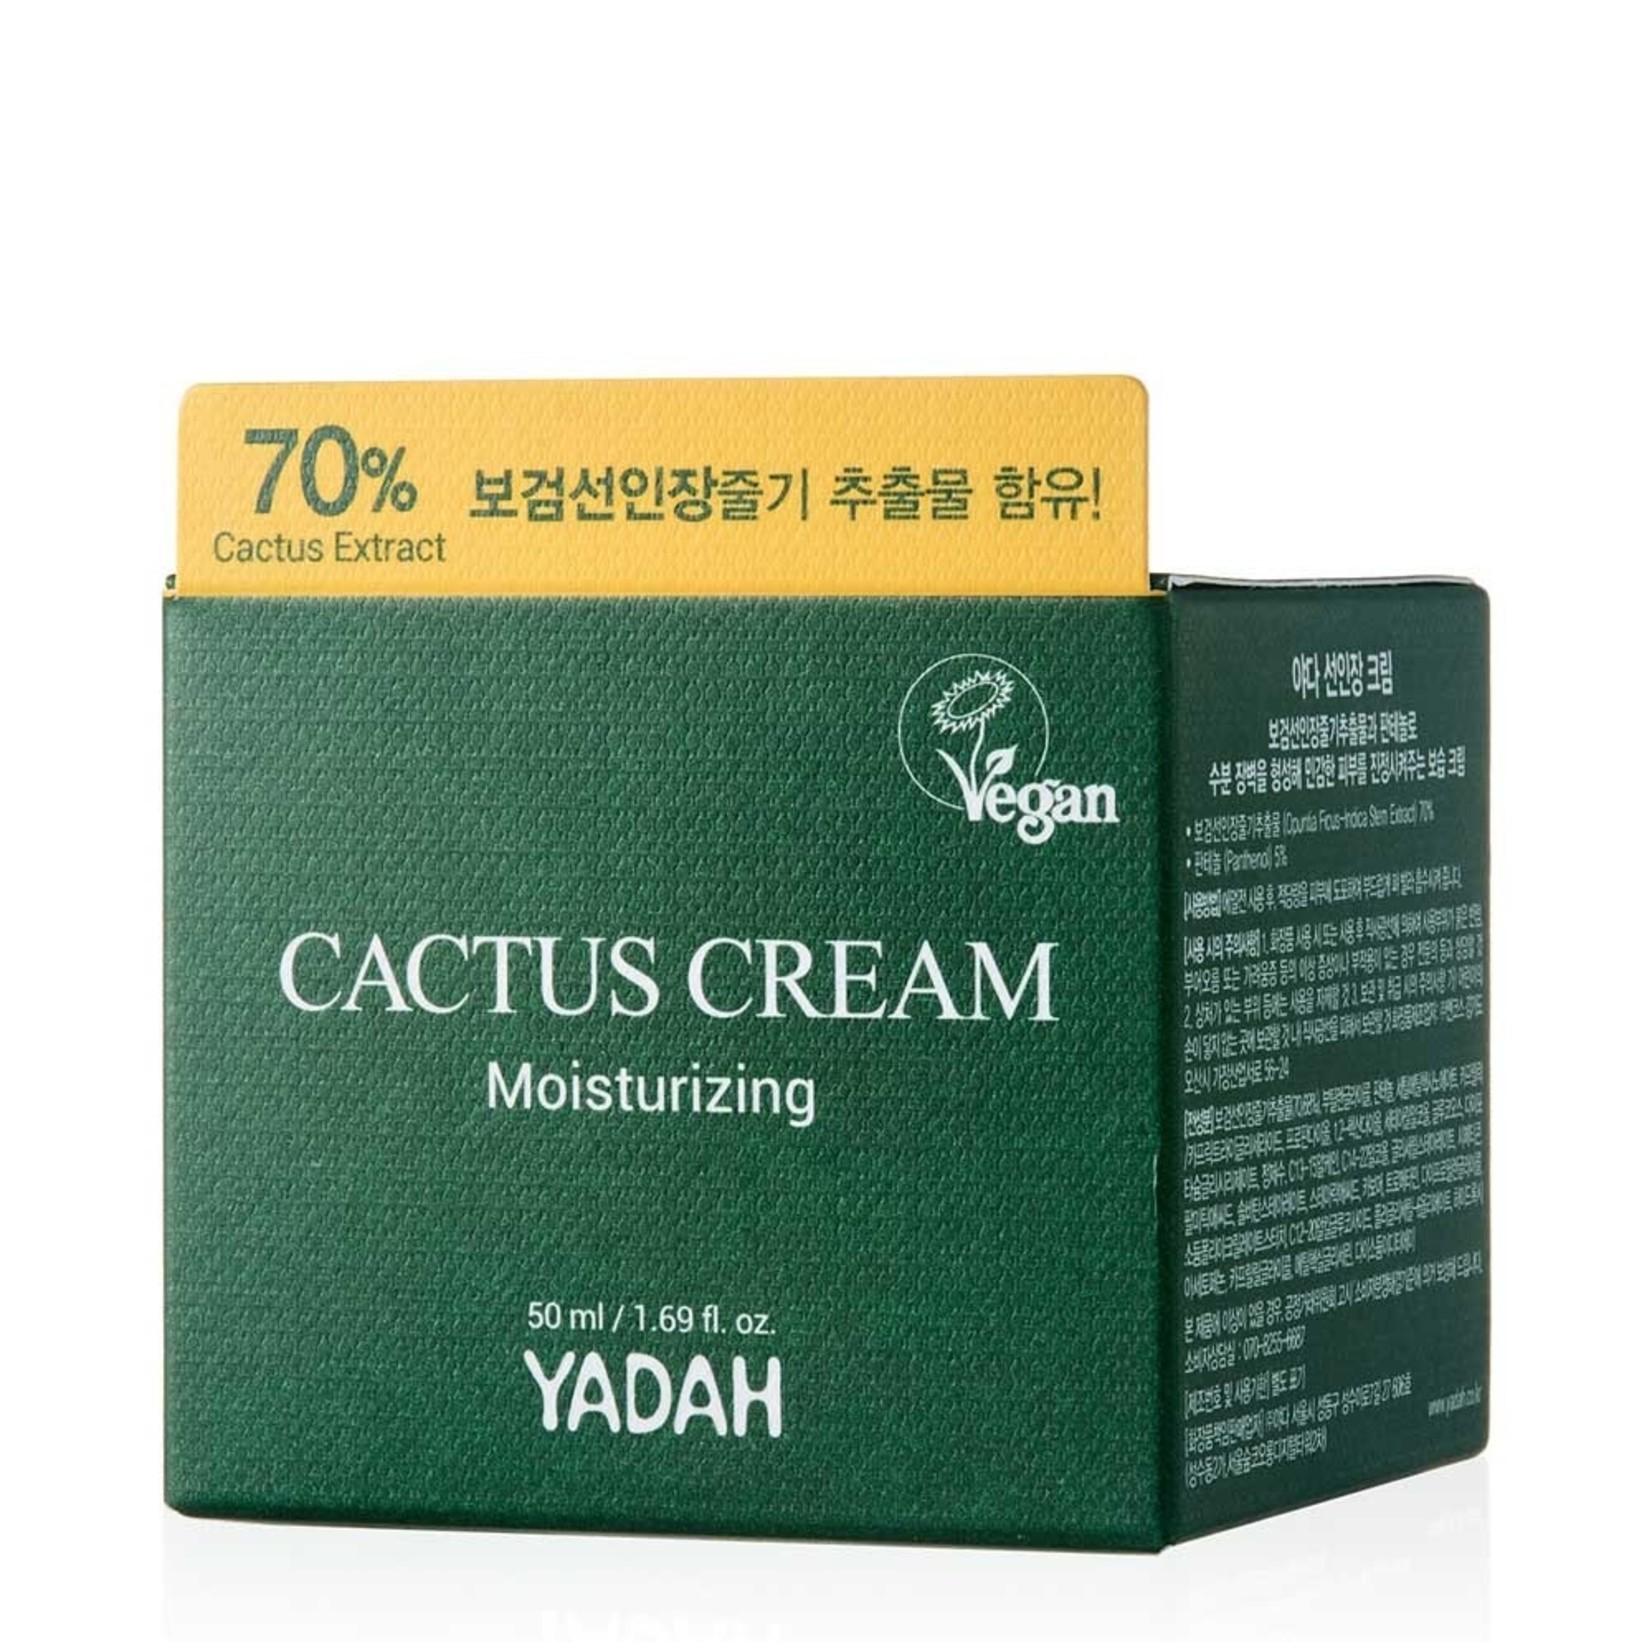 Yadah Cactus Cream